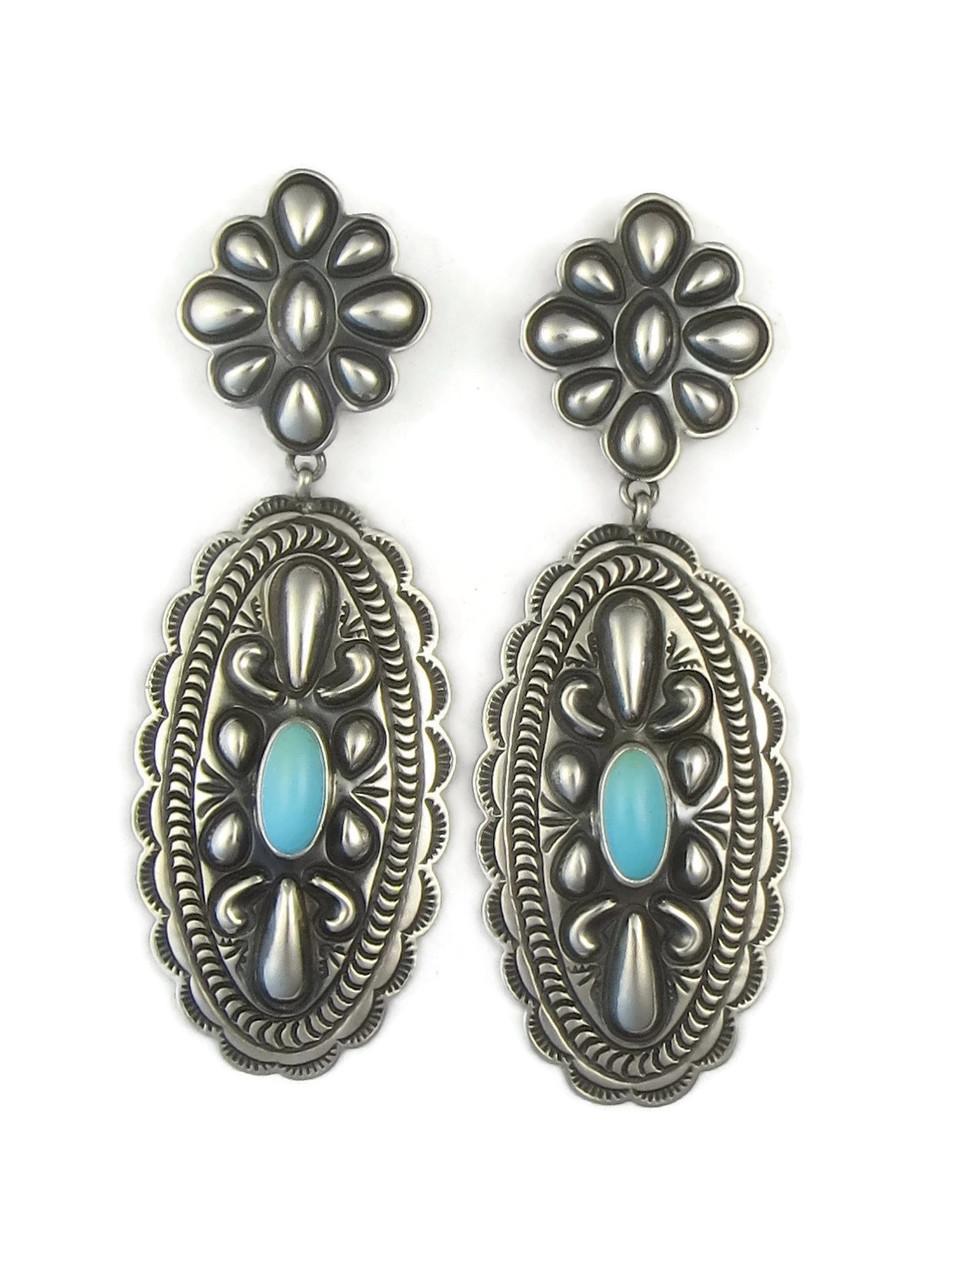 Sleeping Beauty Turquoise Concho Earrings By Tsosie White